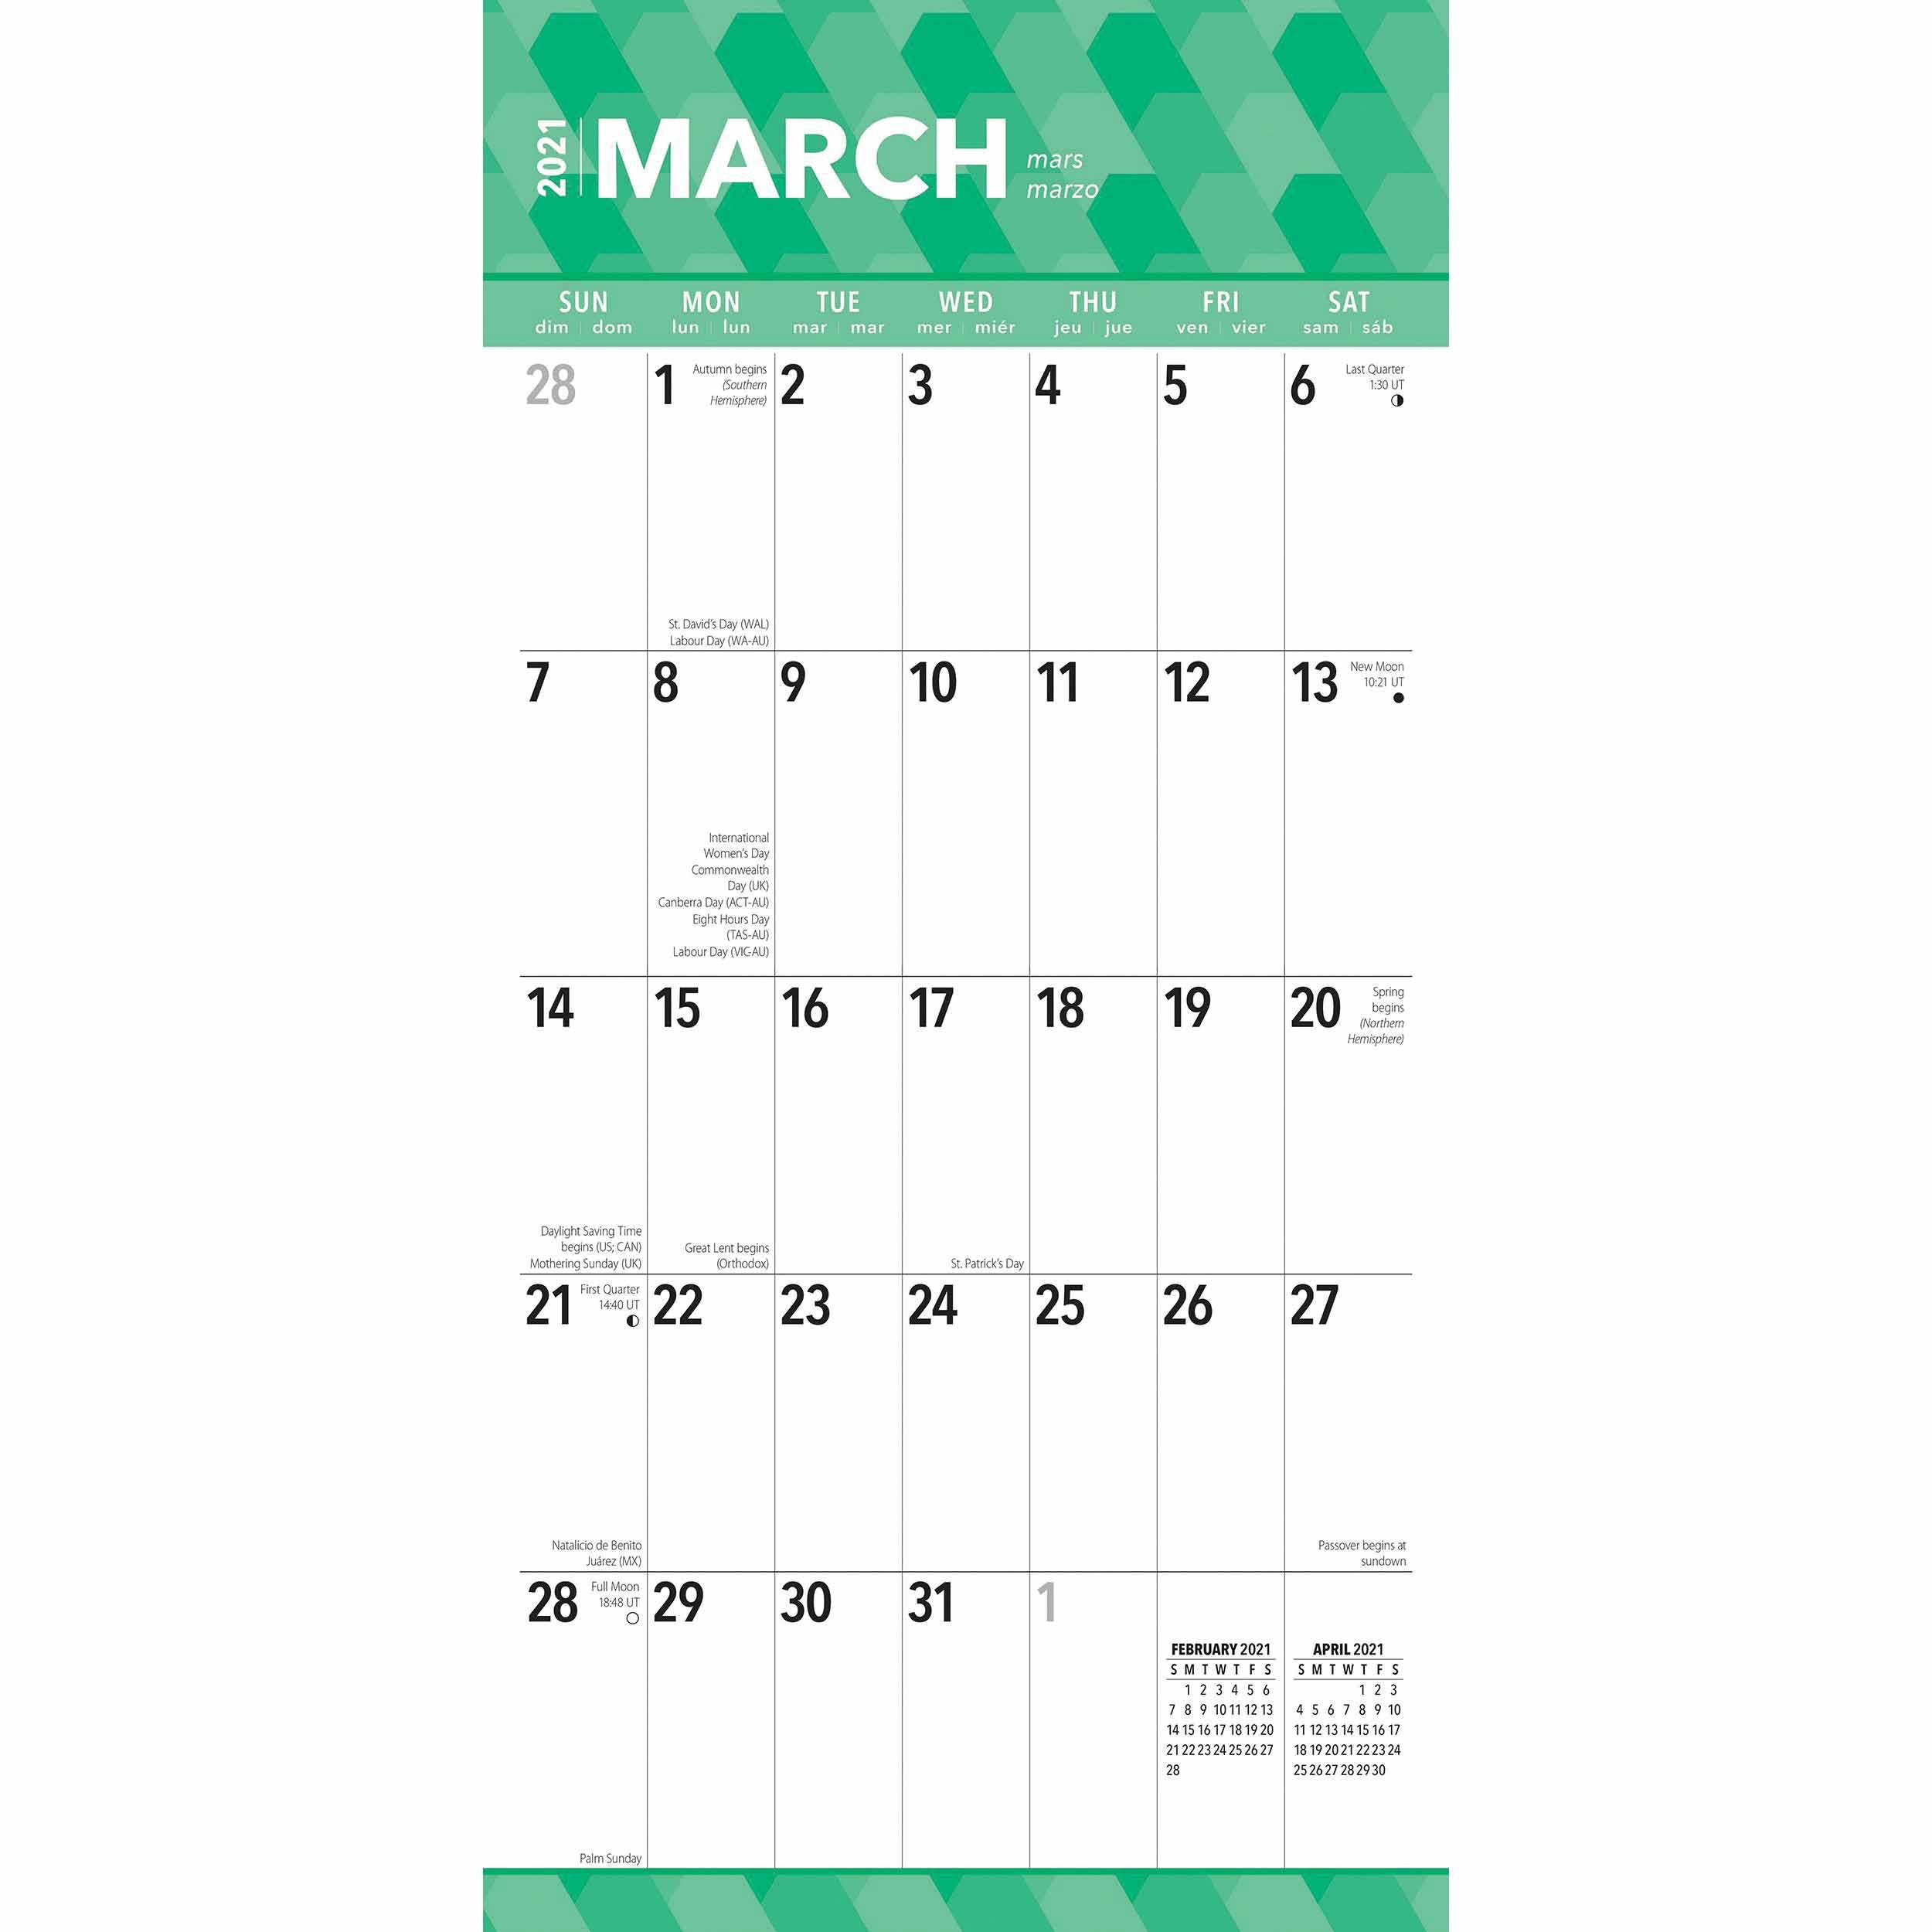 Large Print Calendar 2021 At Calendar Club-2021 Calendar Squares To Rpint